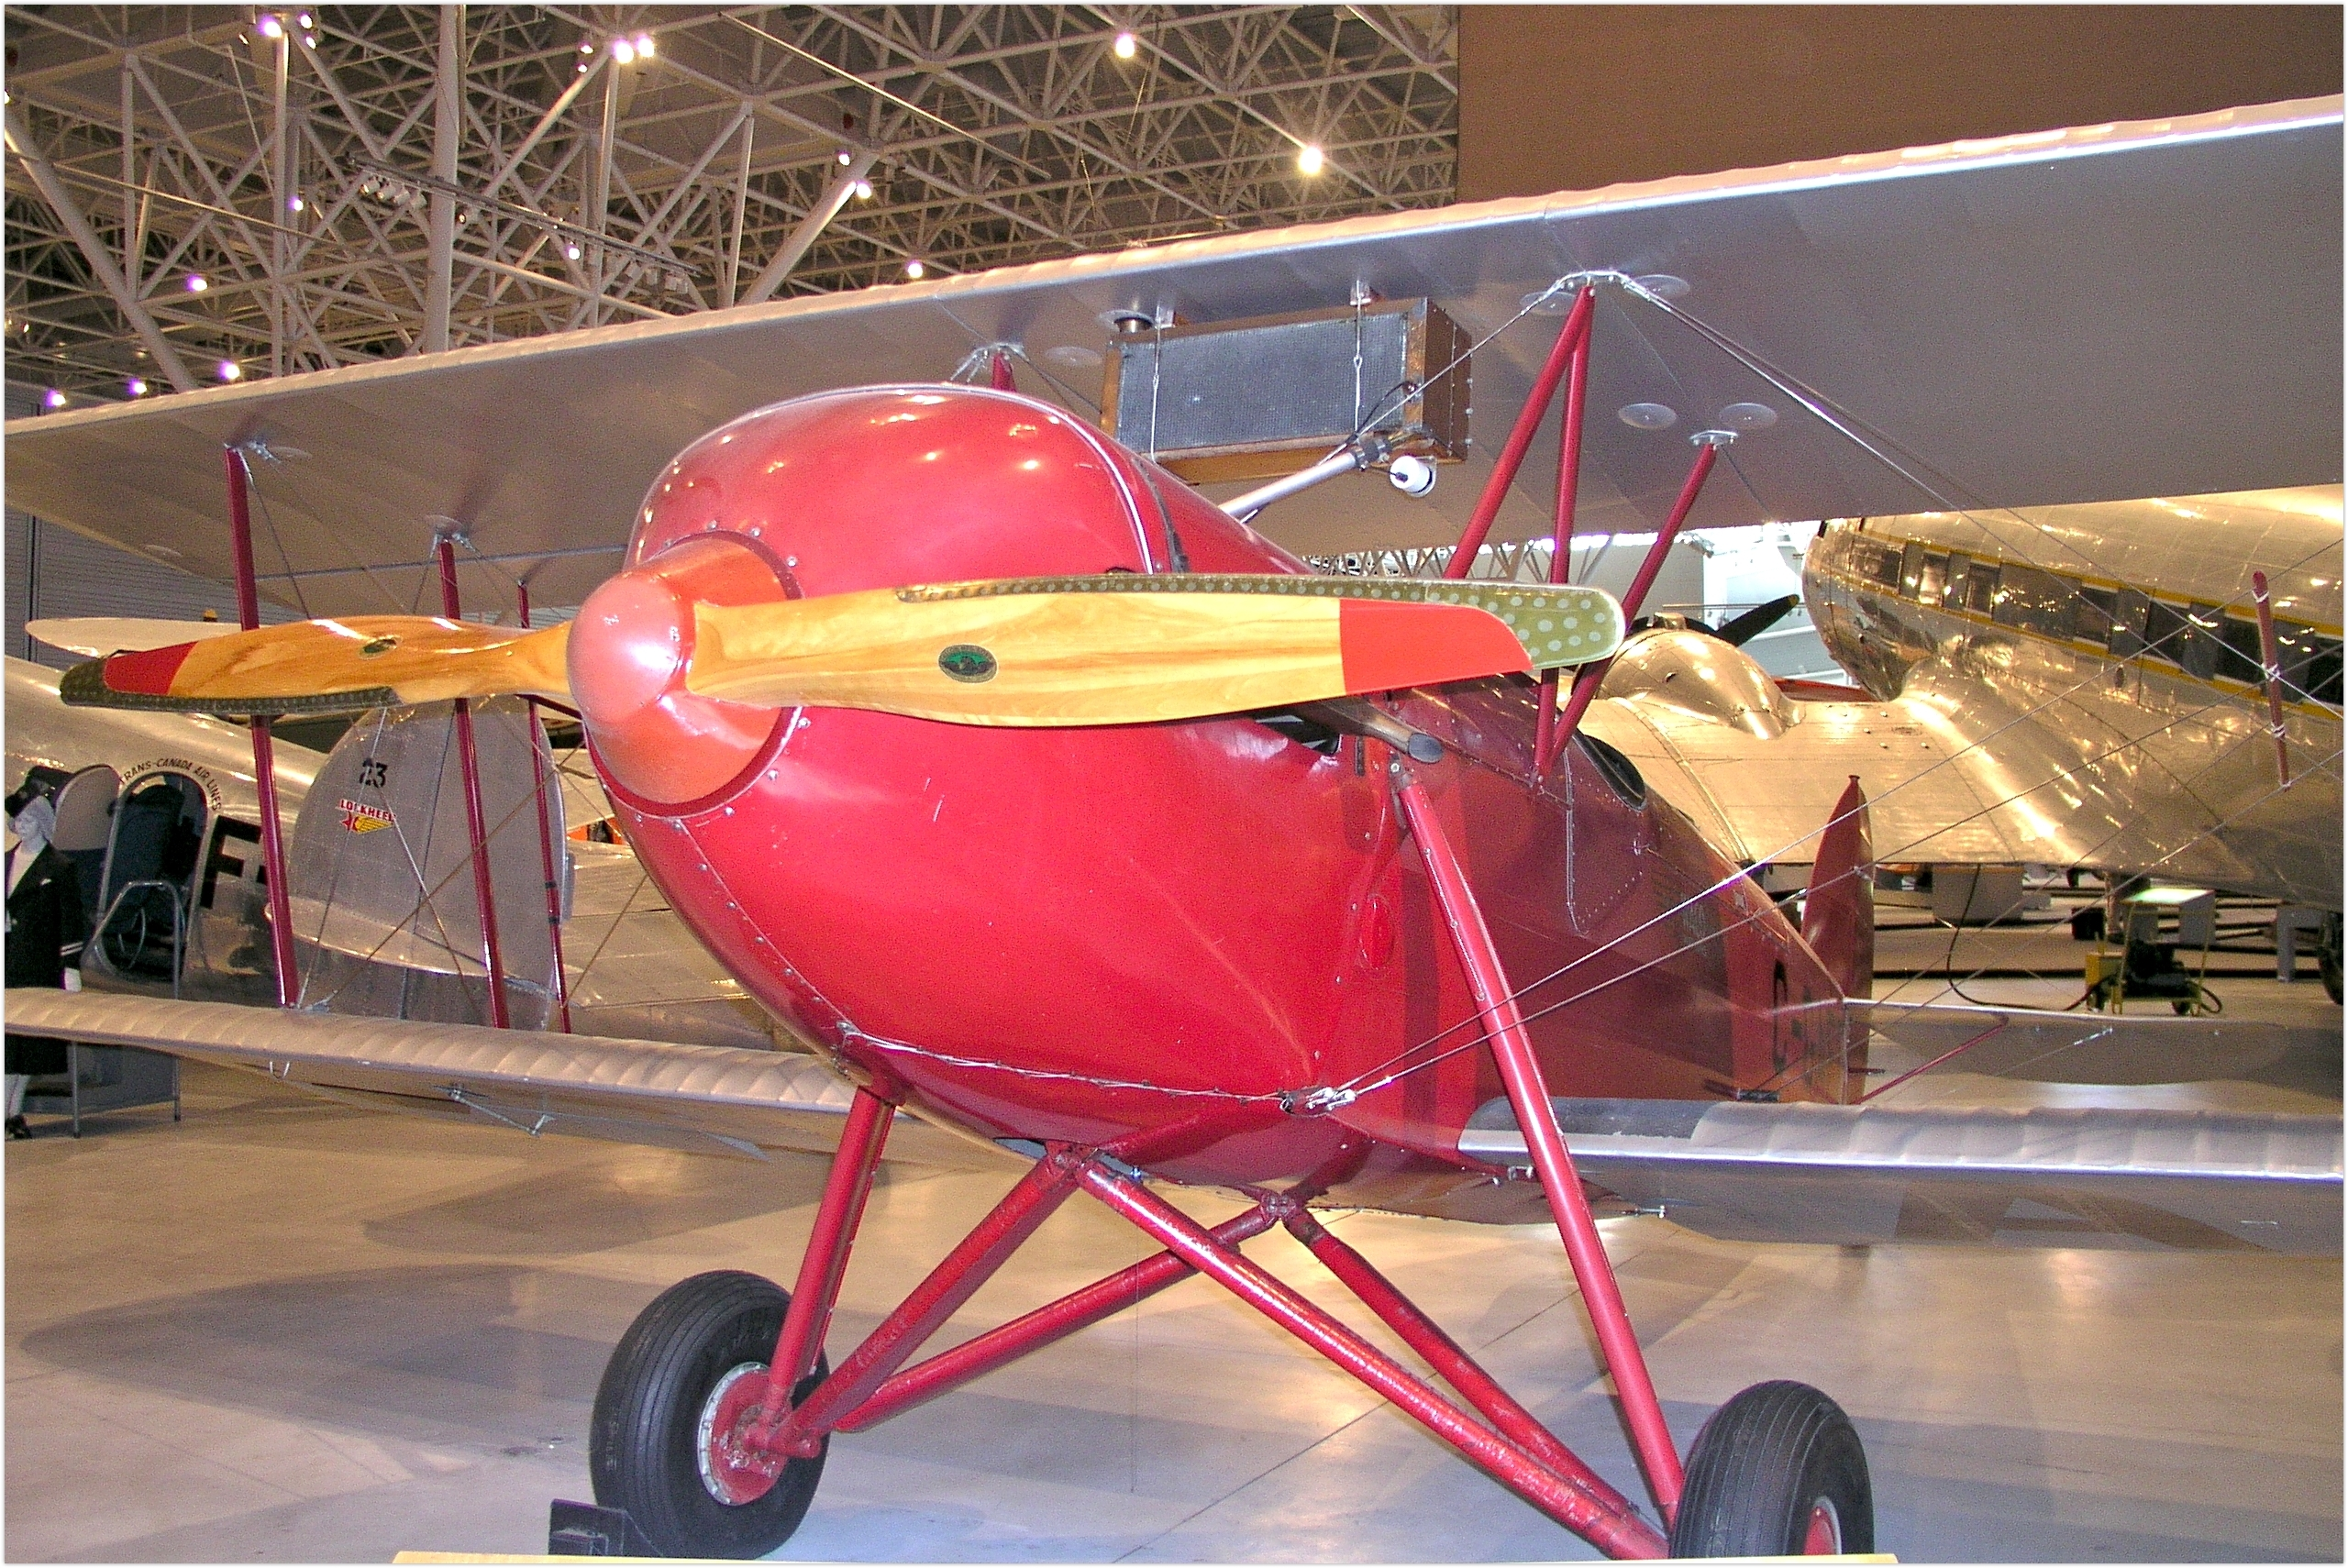 Waco Model 10 Single-engine two-seat biplane